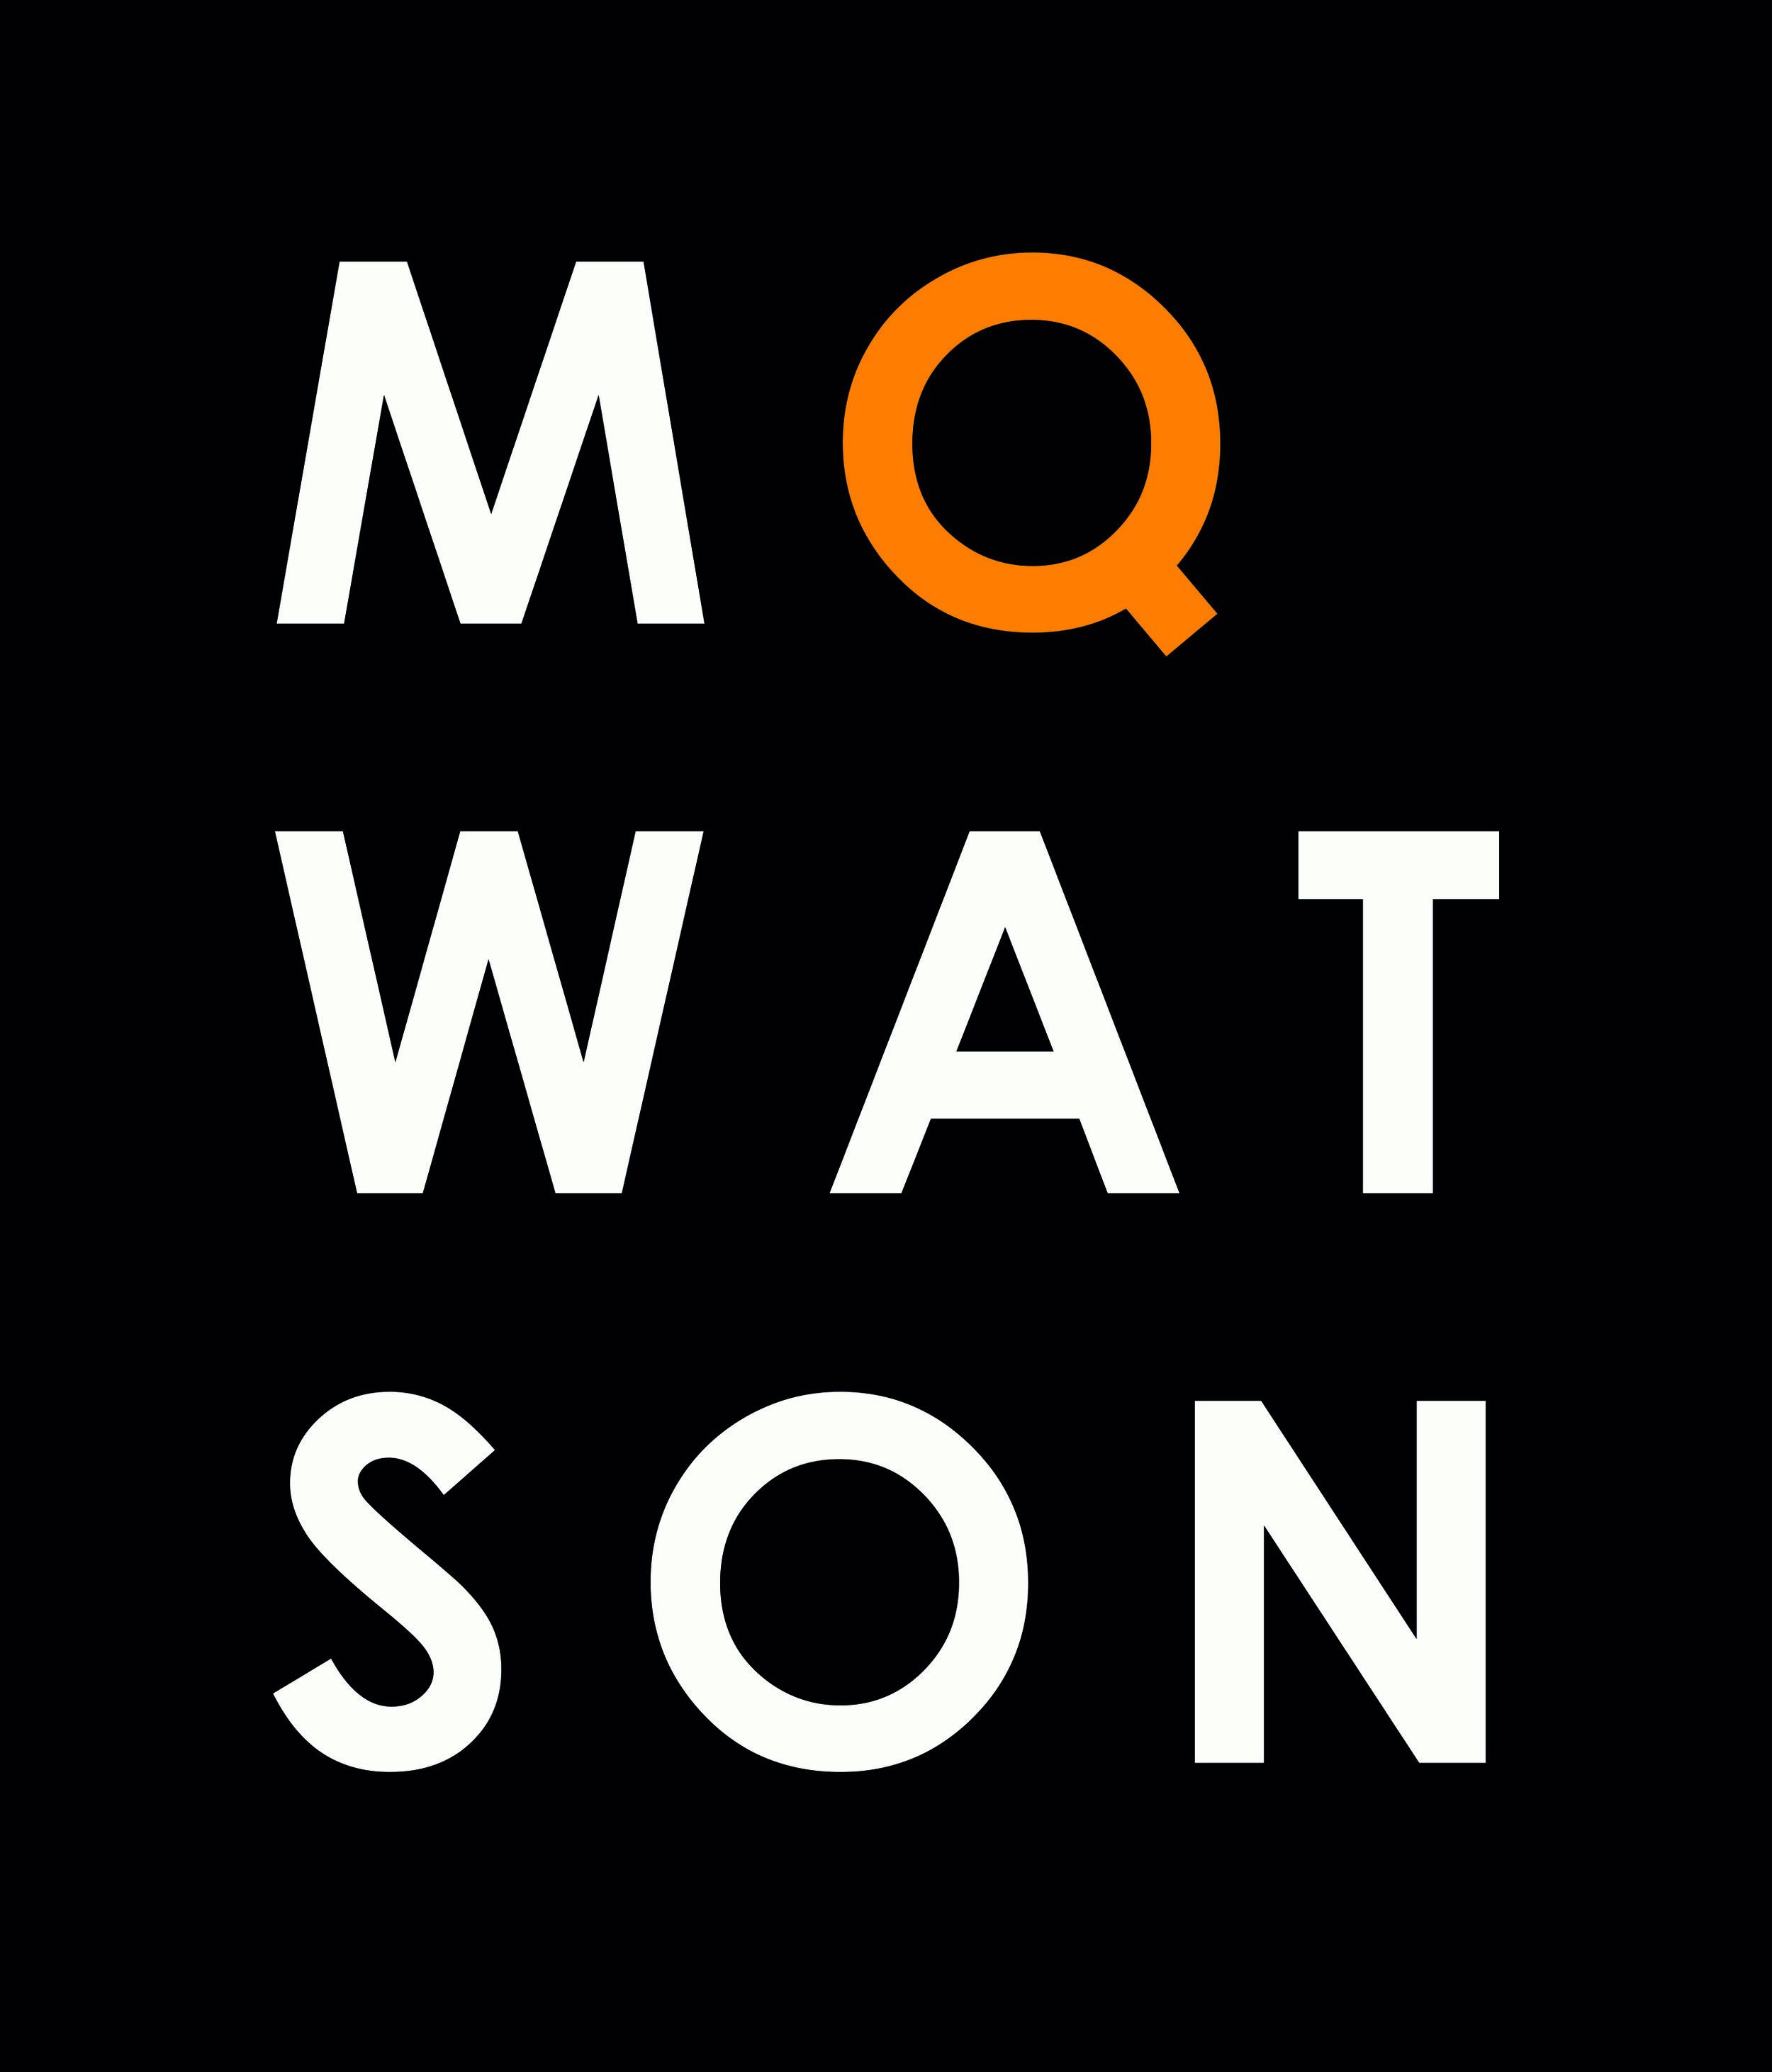 logo-mwq.jpg